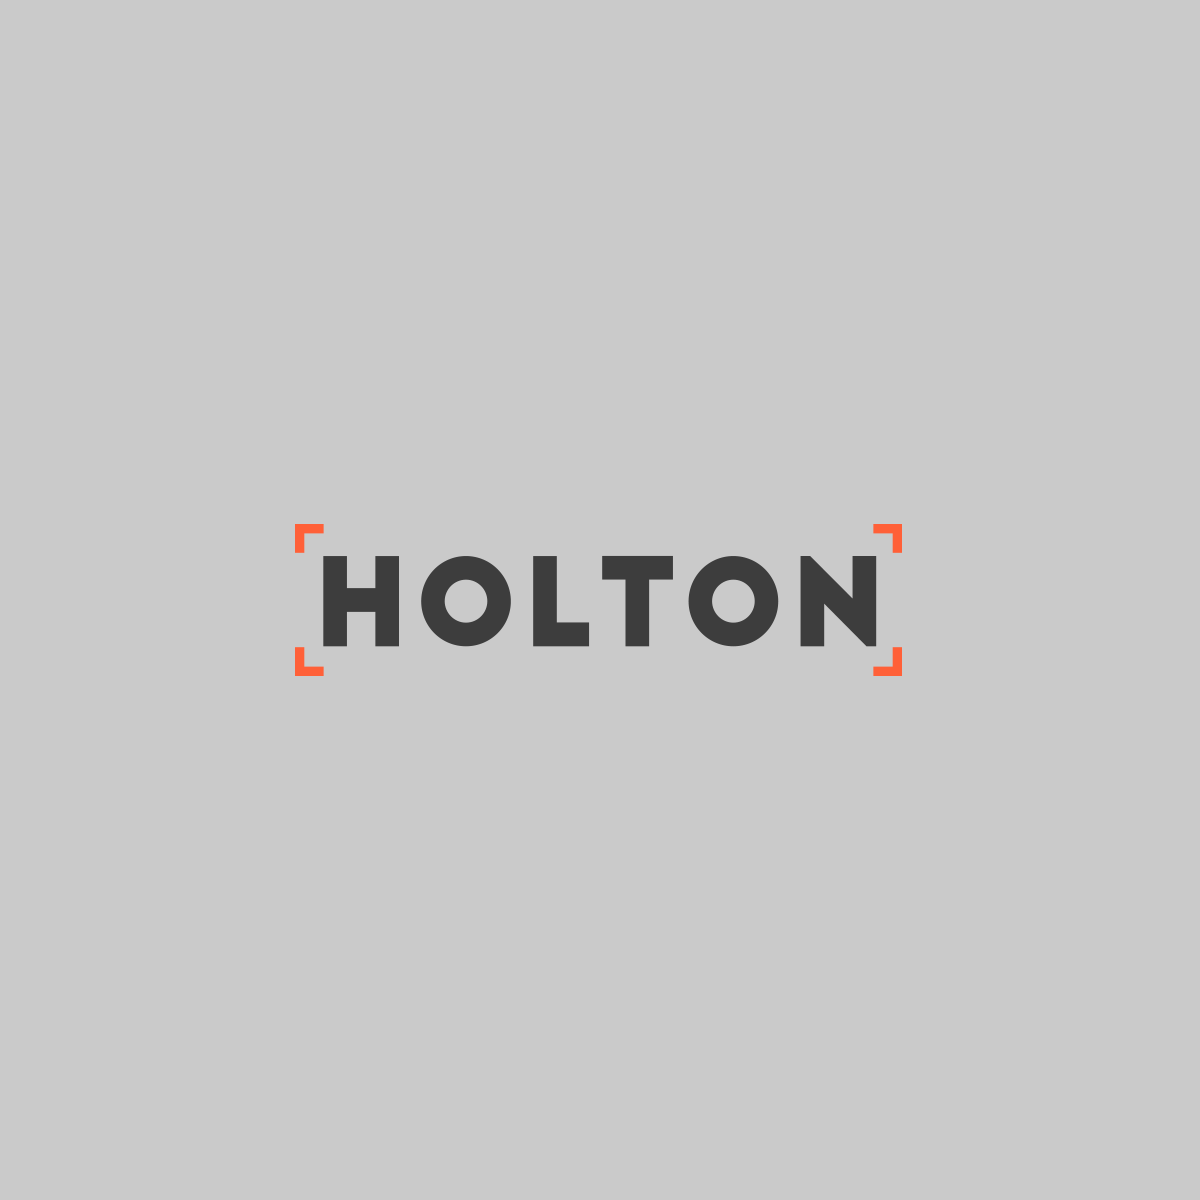 holton-logo.png